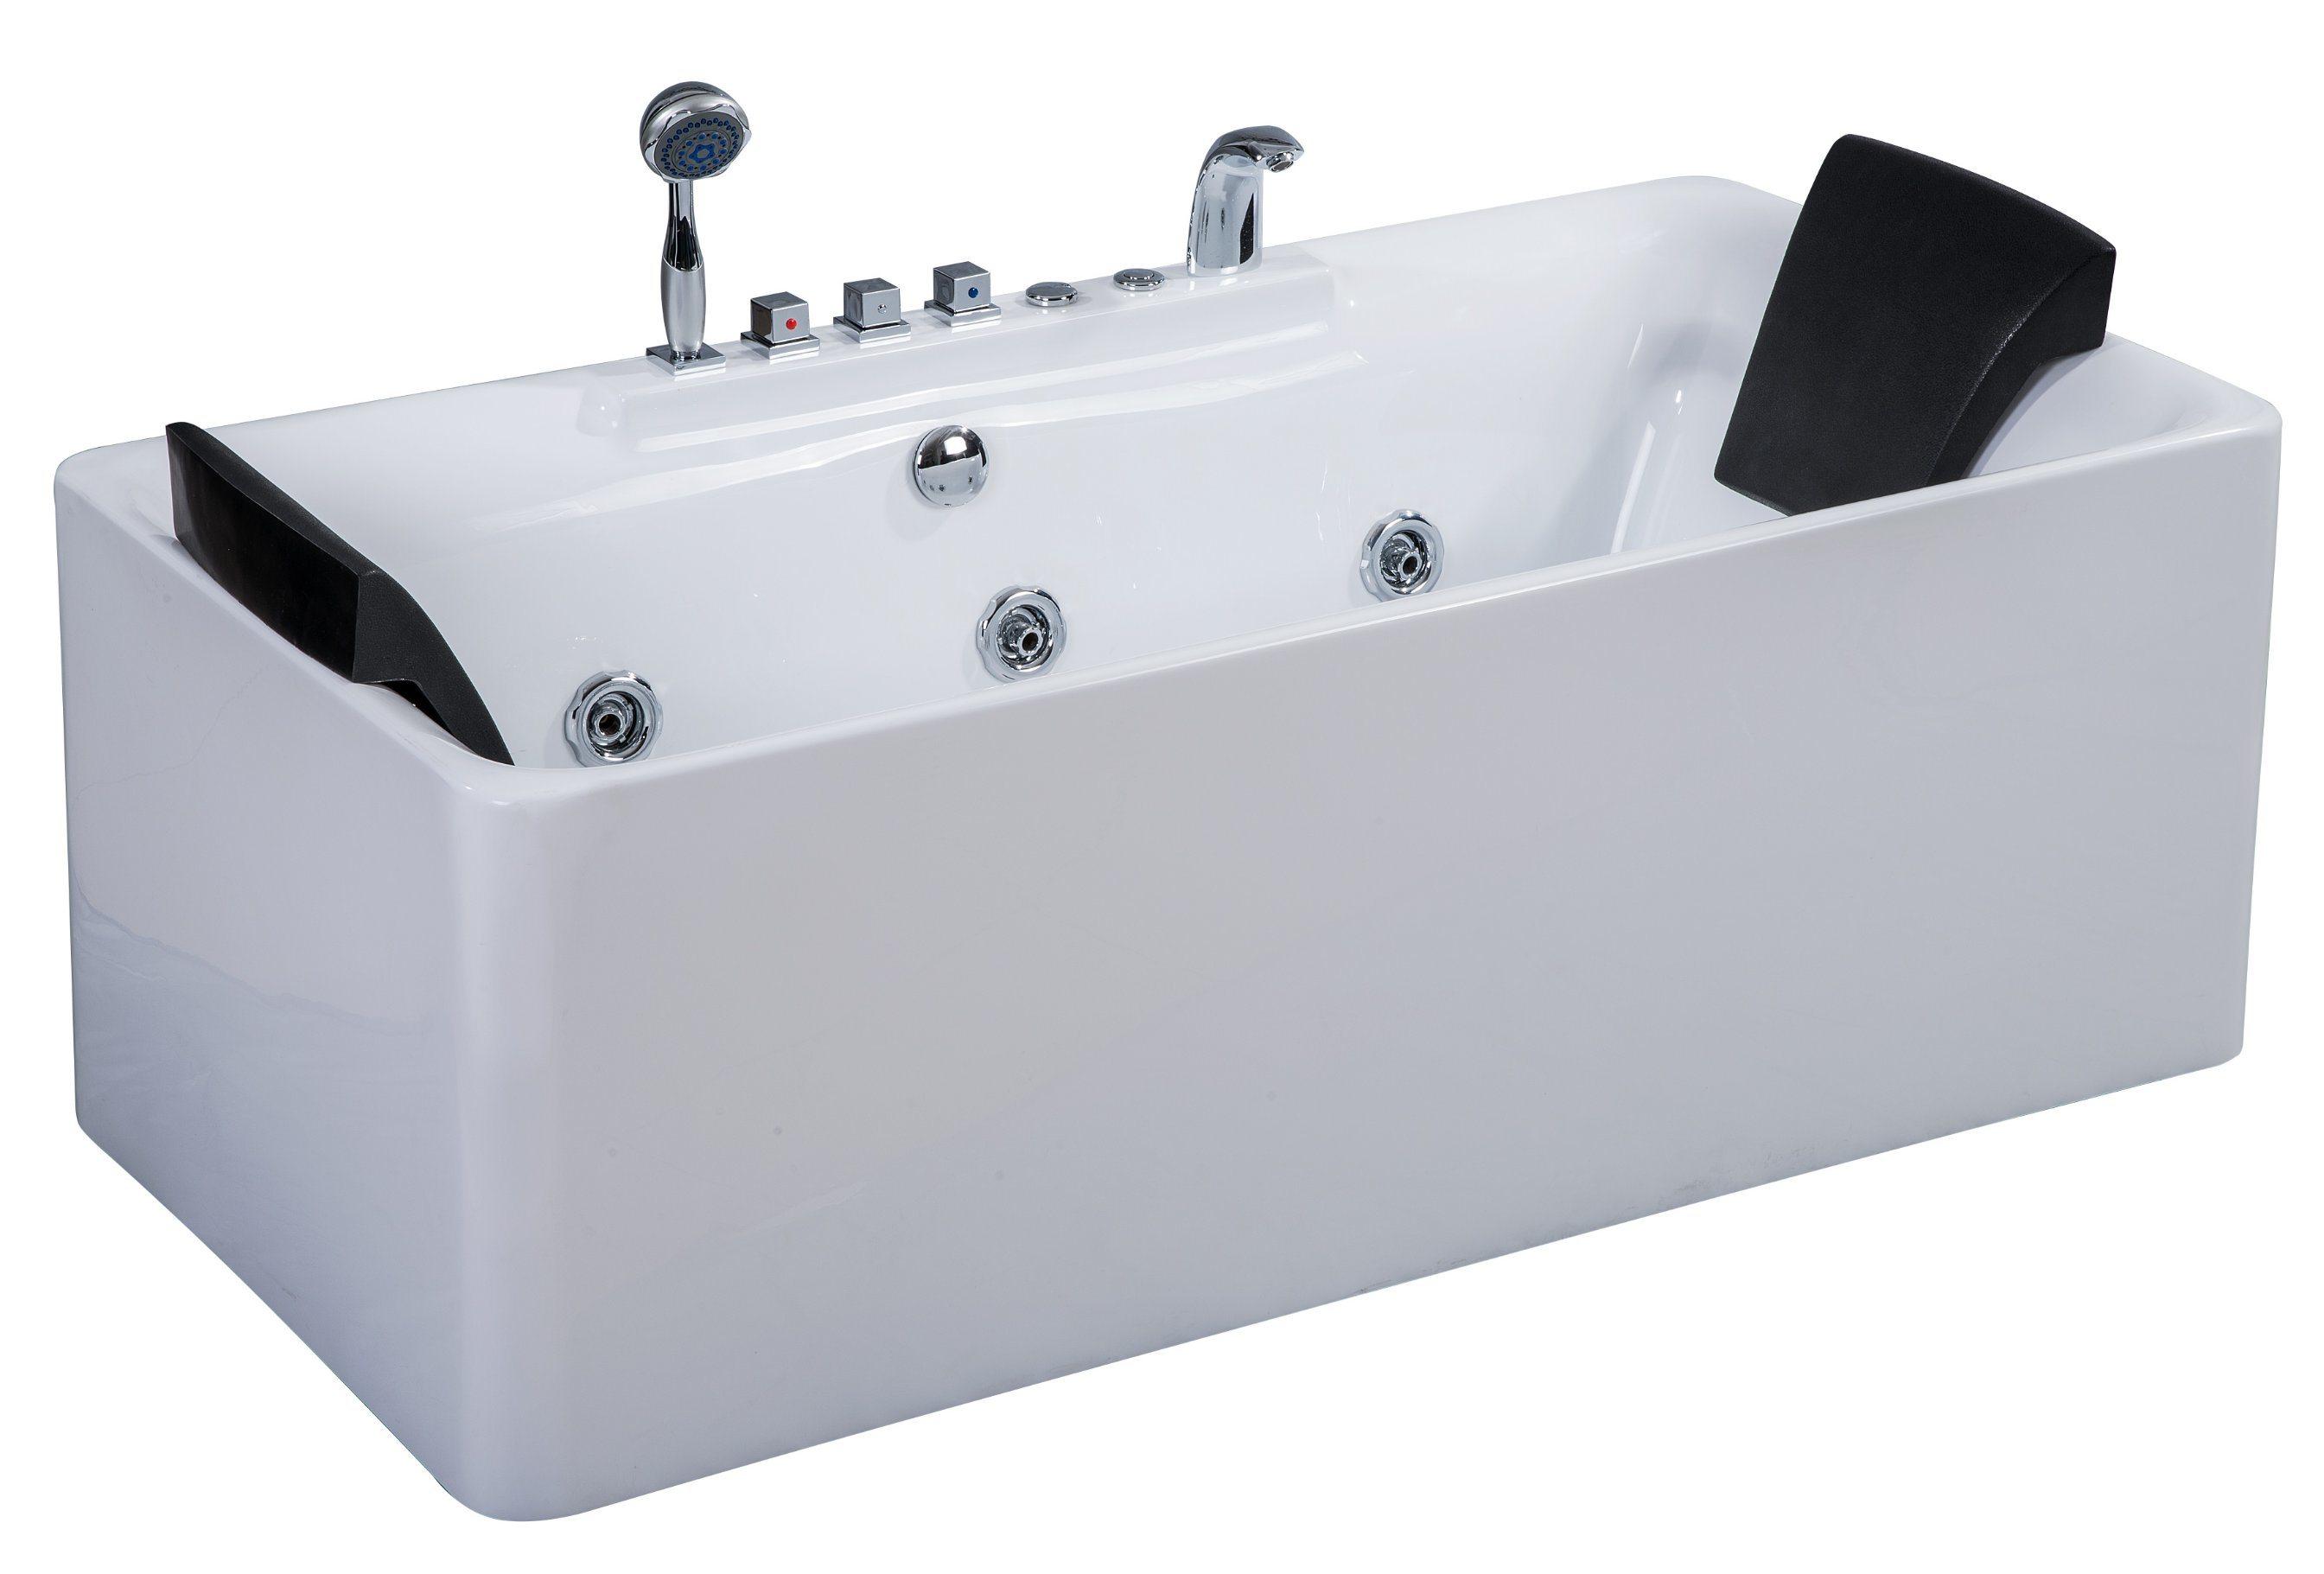 China Portable Computer Control One Piece Whirlpool Bathtub - China ...